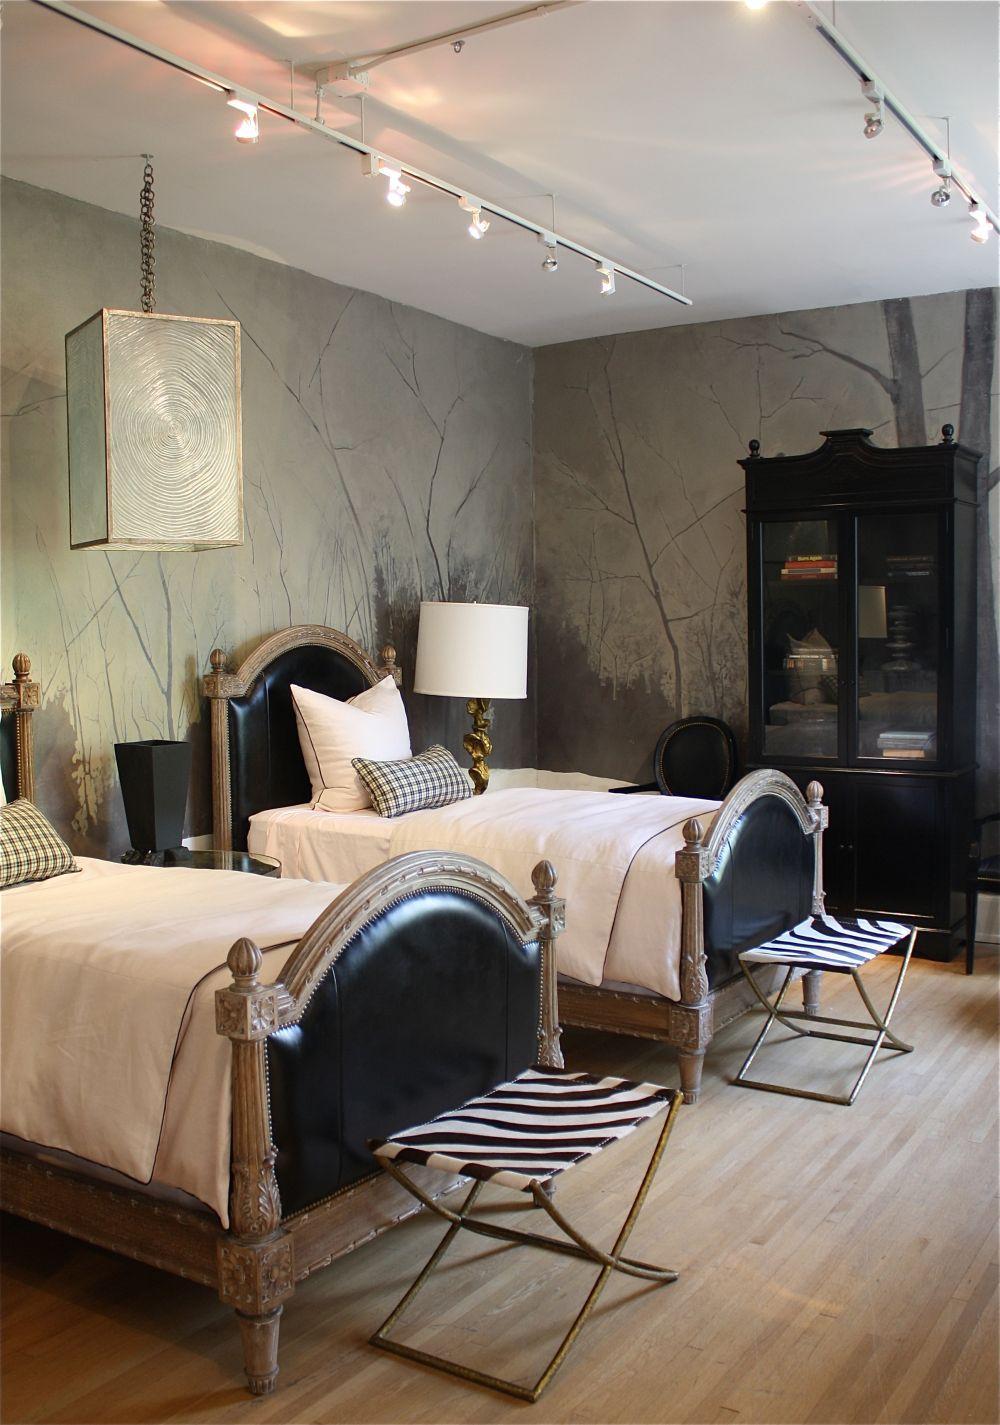 Bedroom Decorating Ideas (970)   https://www.snowbedding.com/